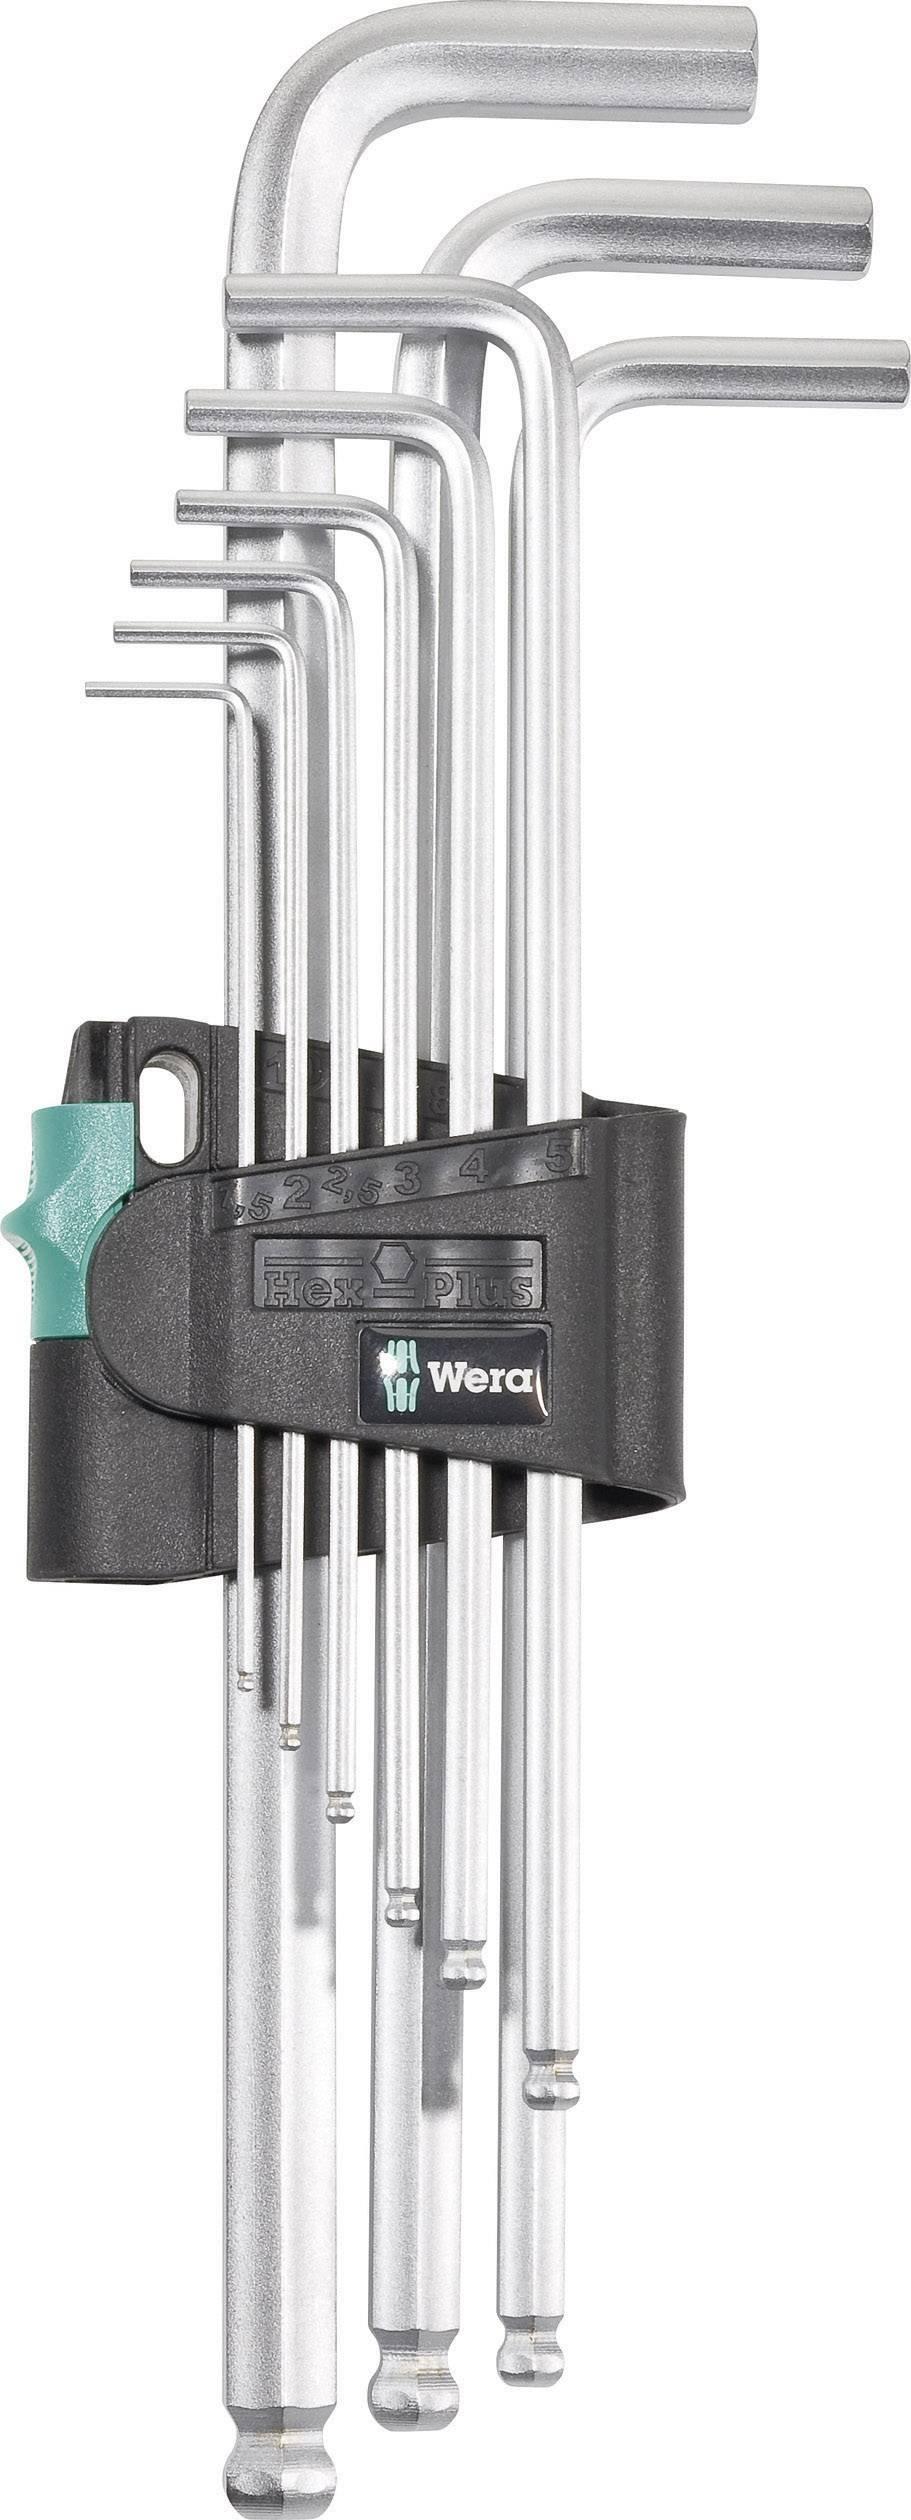 Sada imbusových klíčů Wera Hex -Plus 05022087001, 1,5 - 10 mm, 9 ks